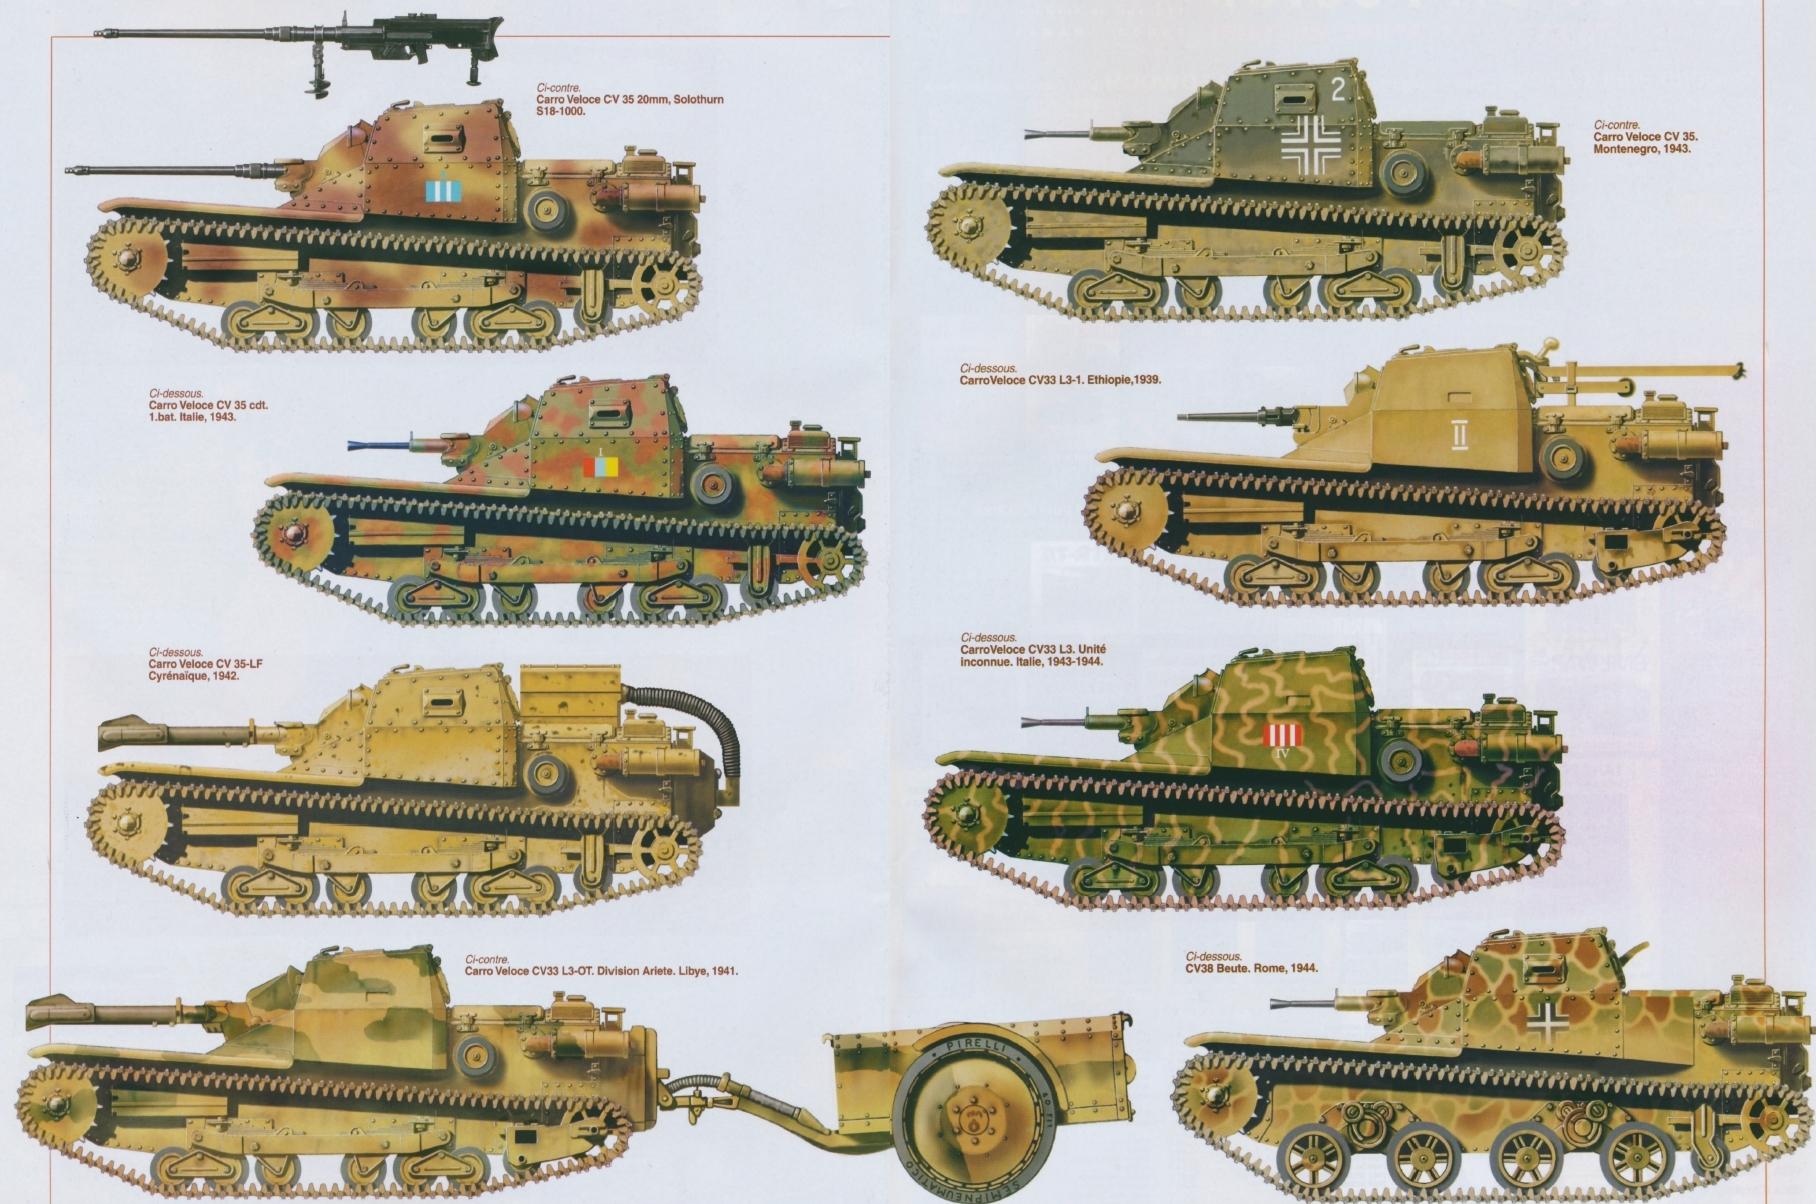 Italian tanks guns 2 ruedas y cadenas militares pinterest italian tanks guns 2 sciox Images